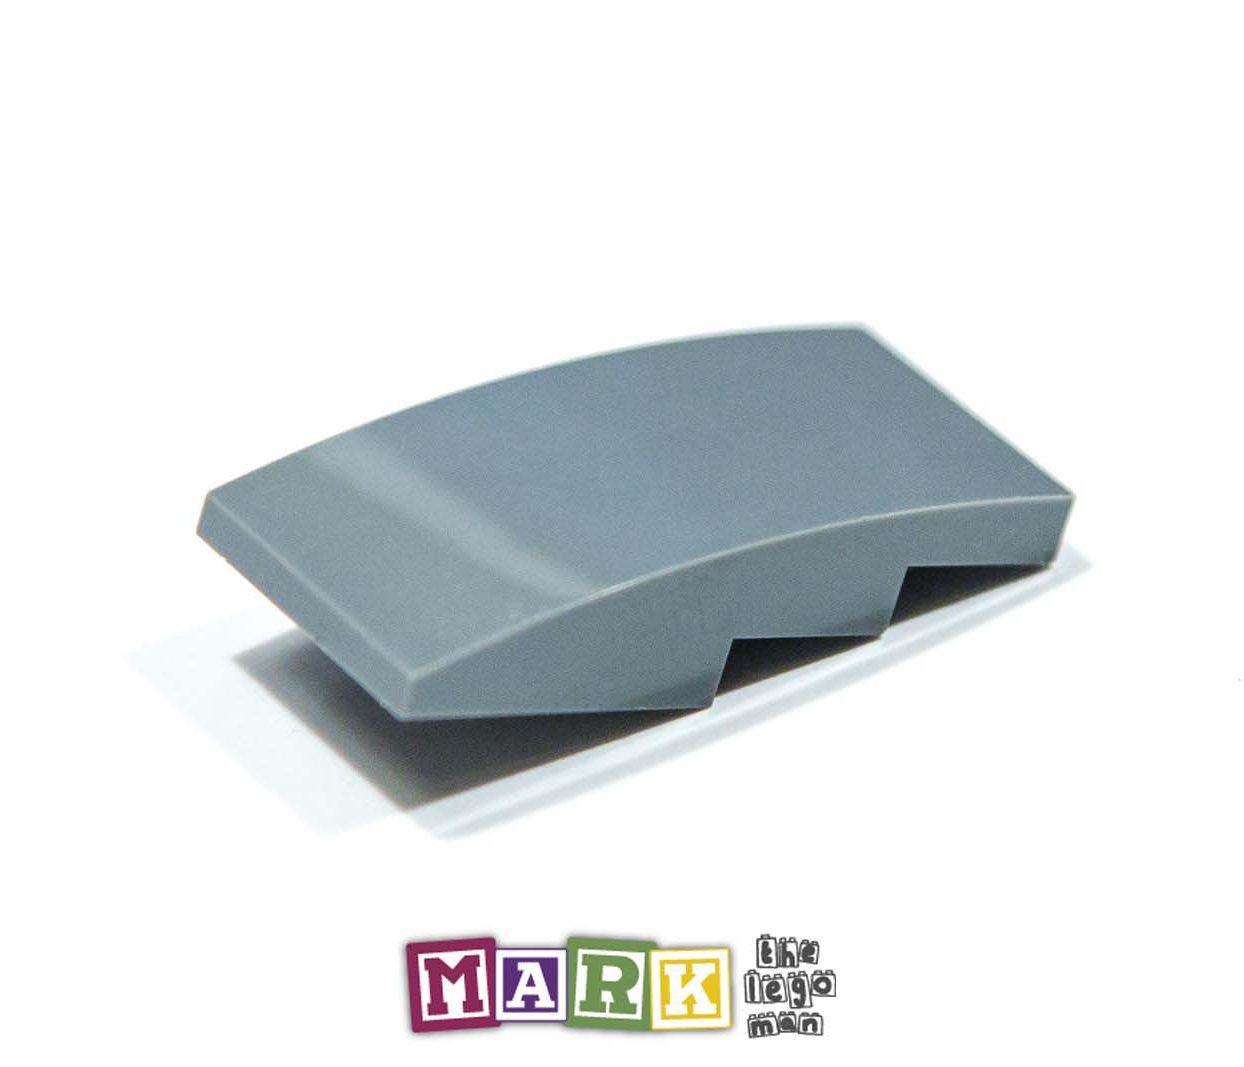 Lego 6005668 93606 1x Dark Blueish Grey Dark Stone Dark Standard Grey 2x4 Slope Brick With Bow